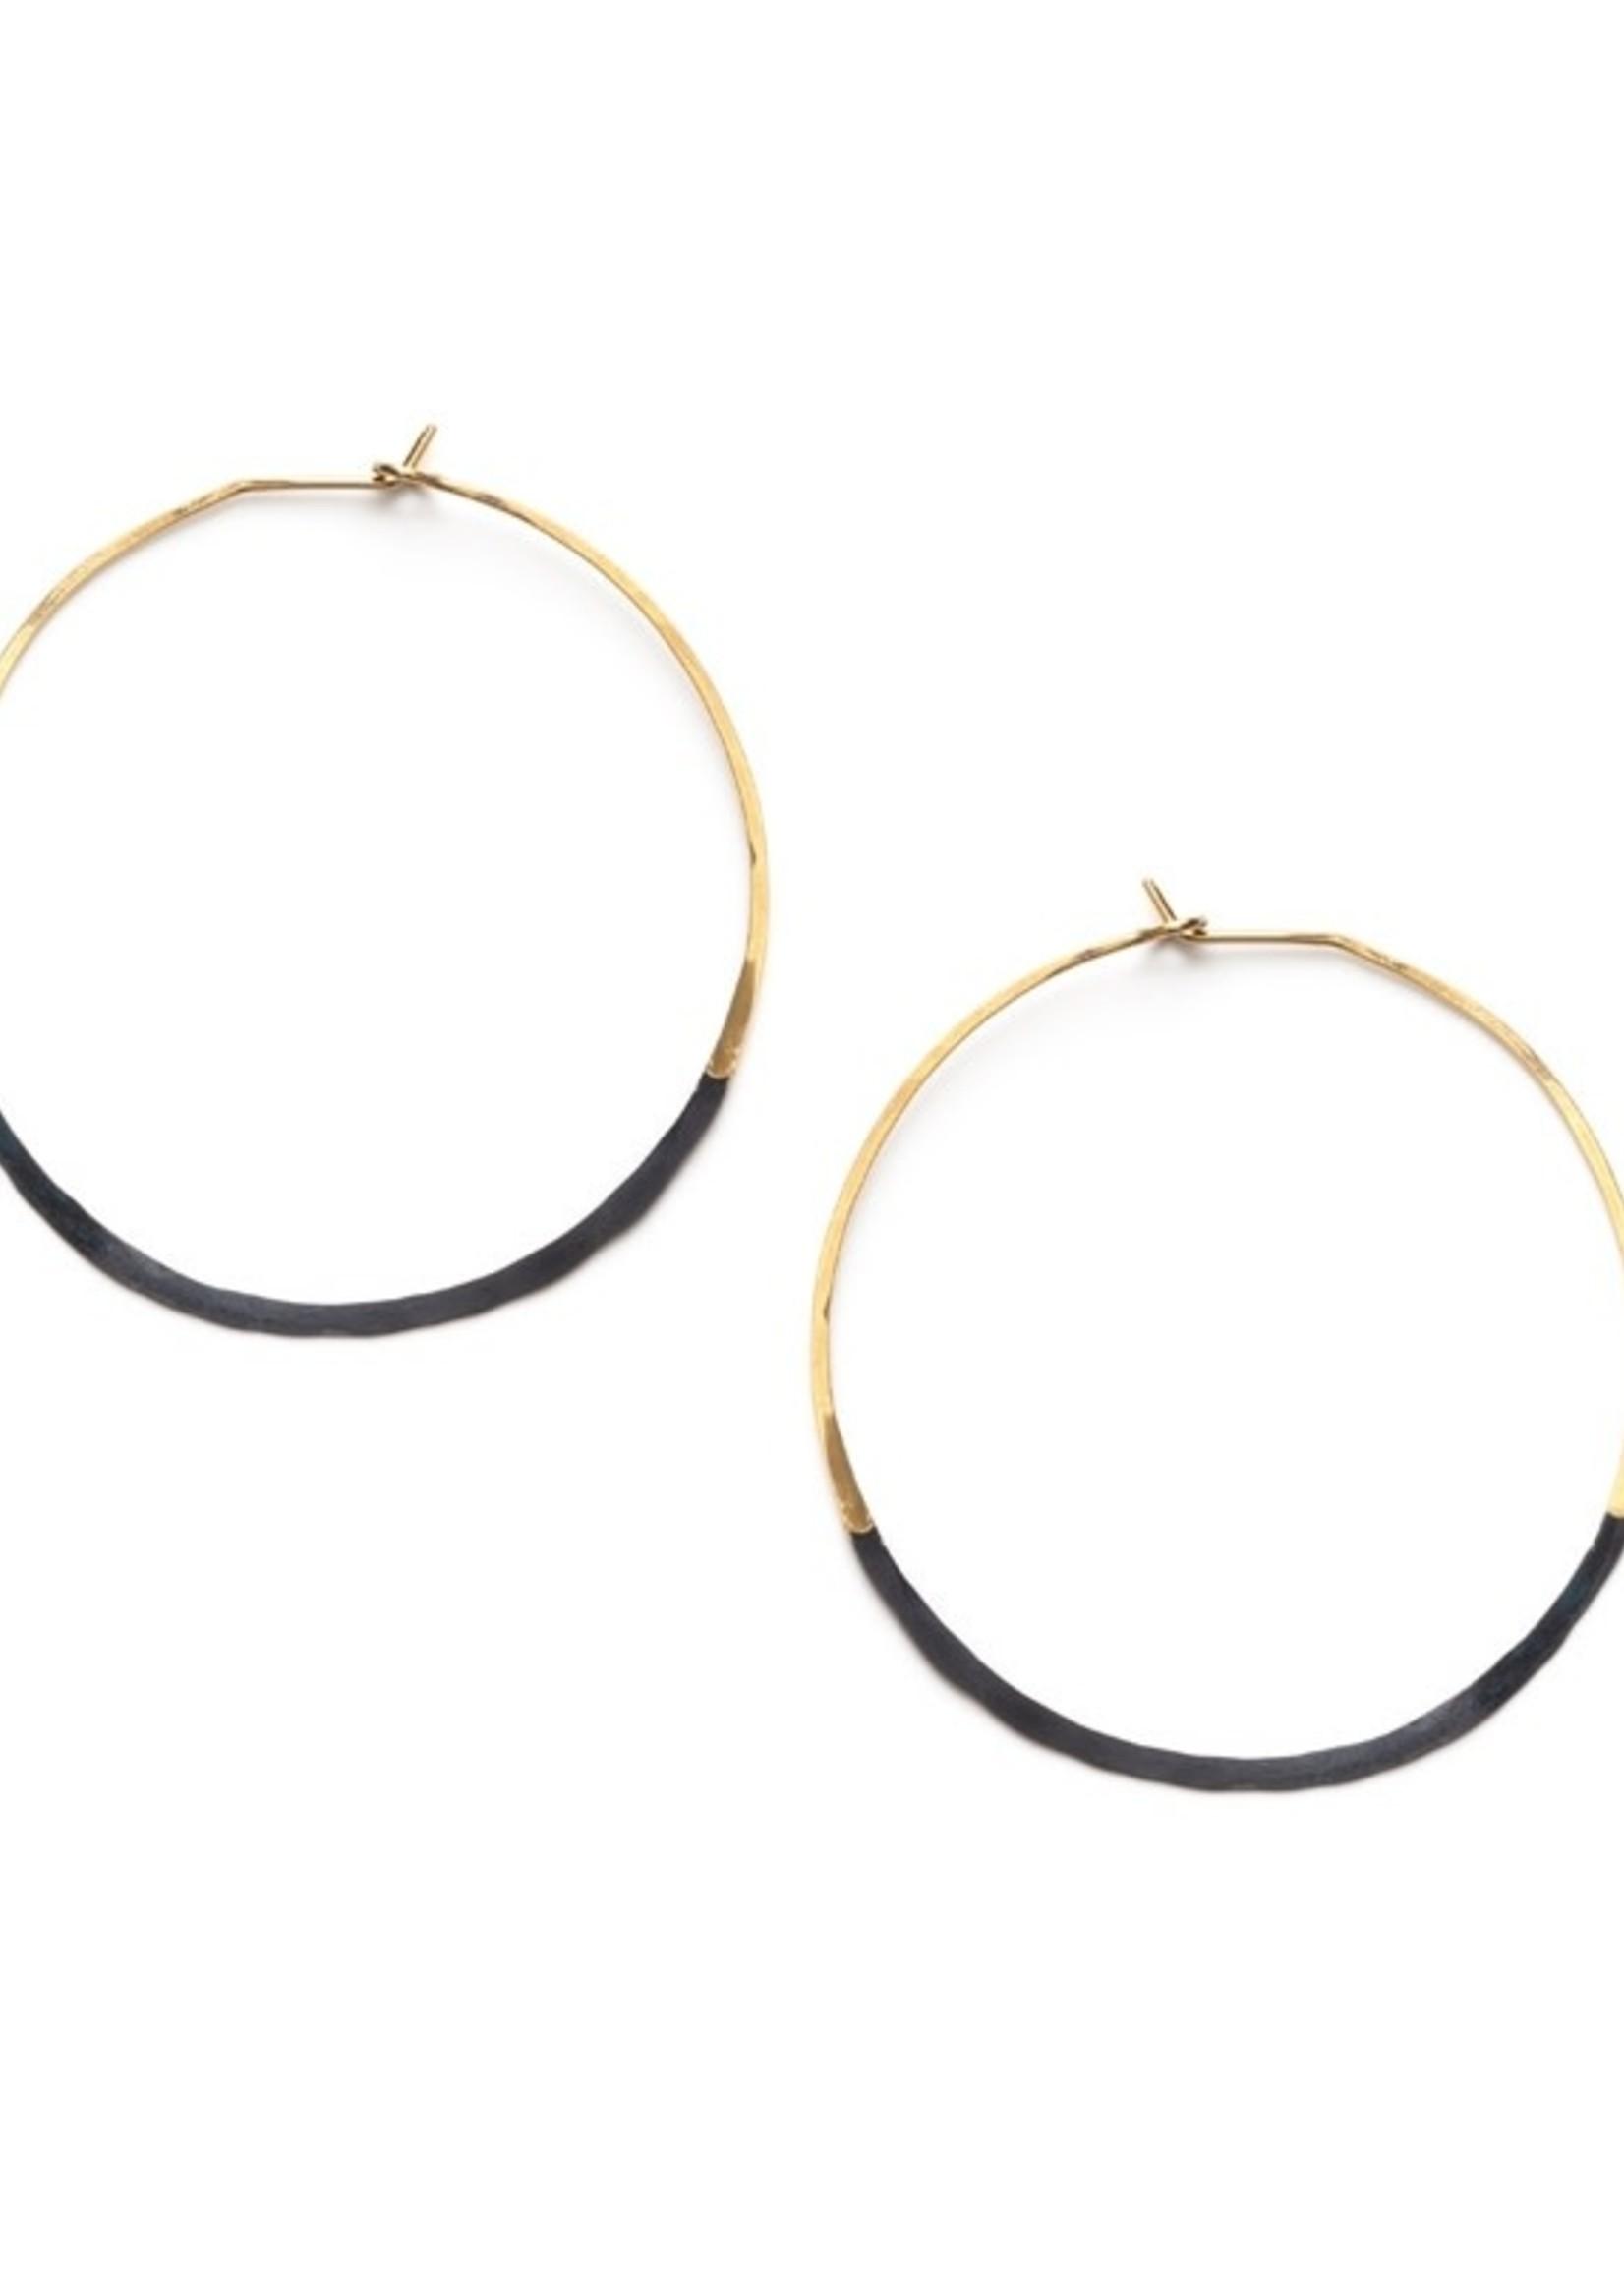 Mind's Eye Design Patina Dipped Circle Hoops